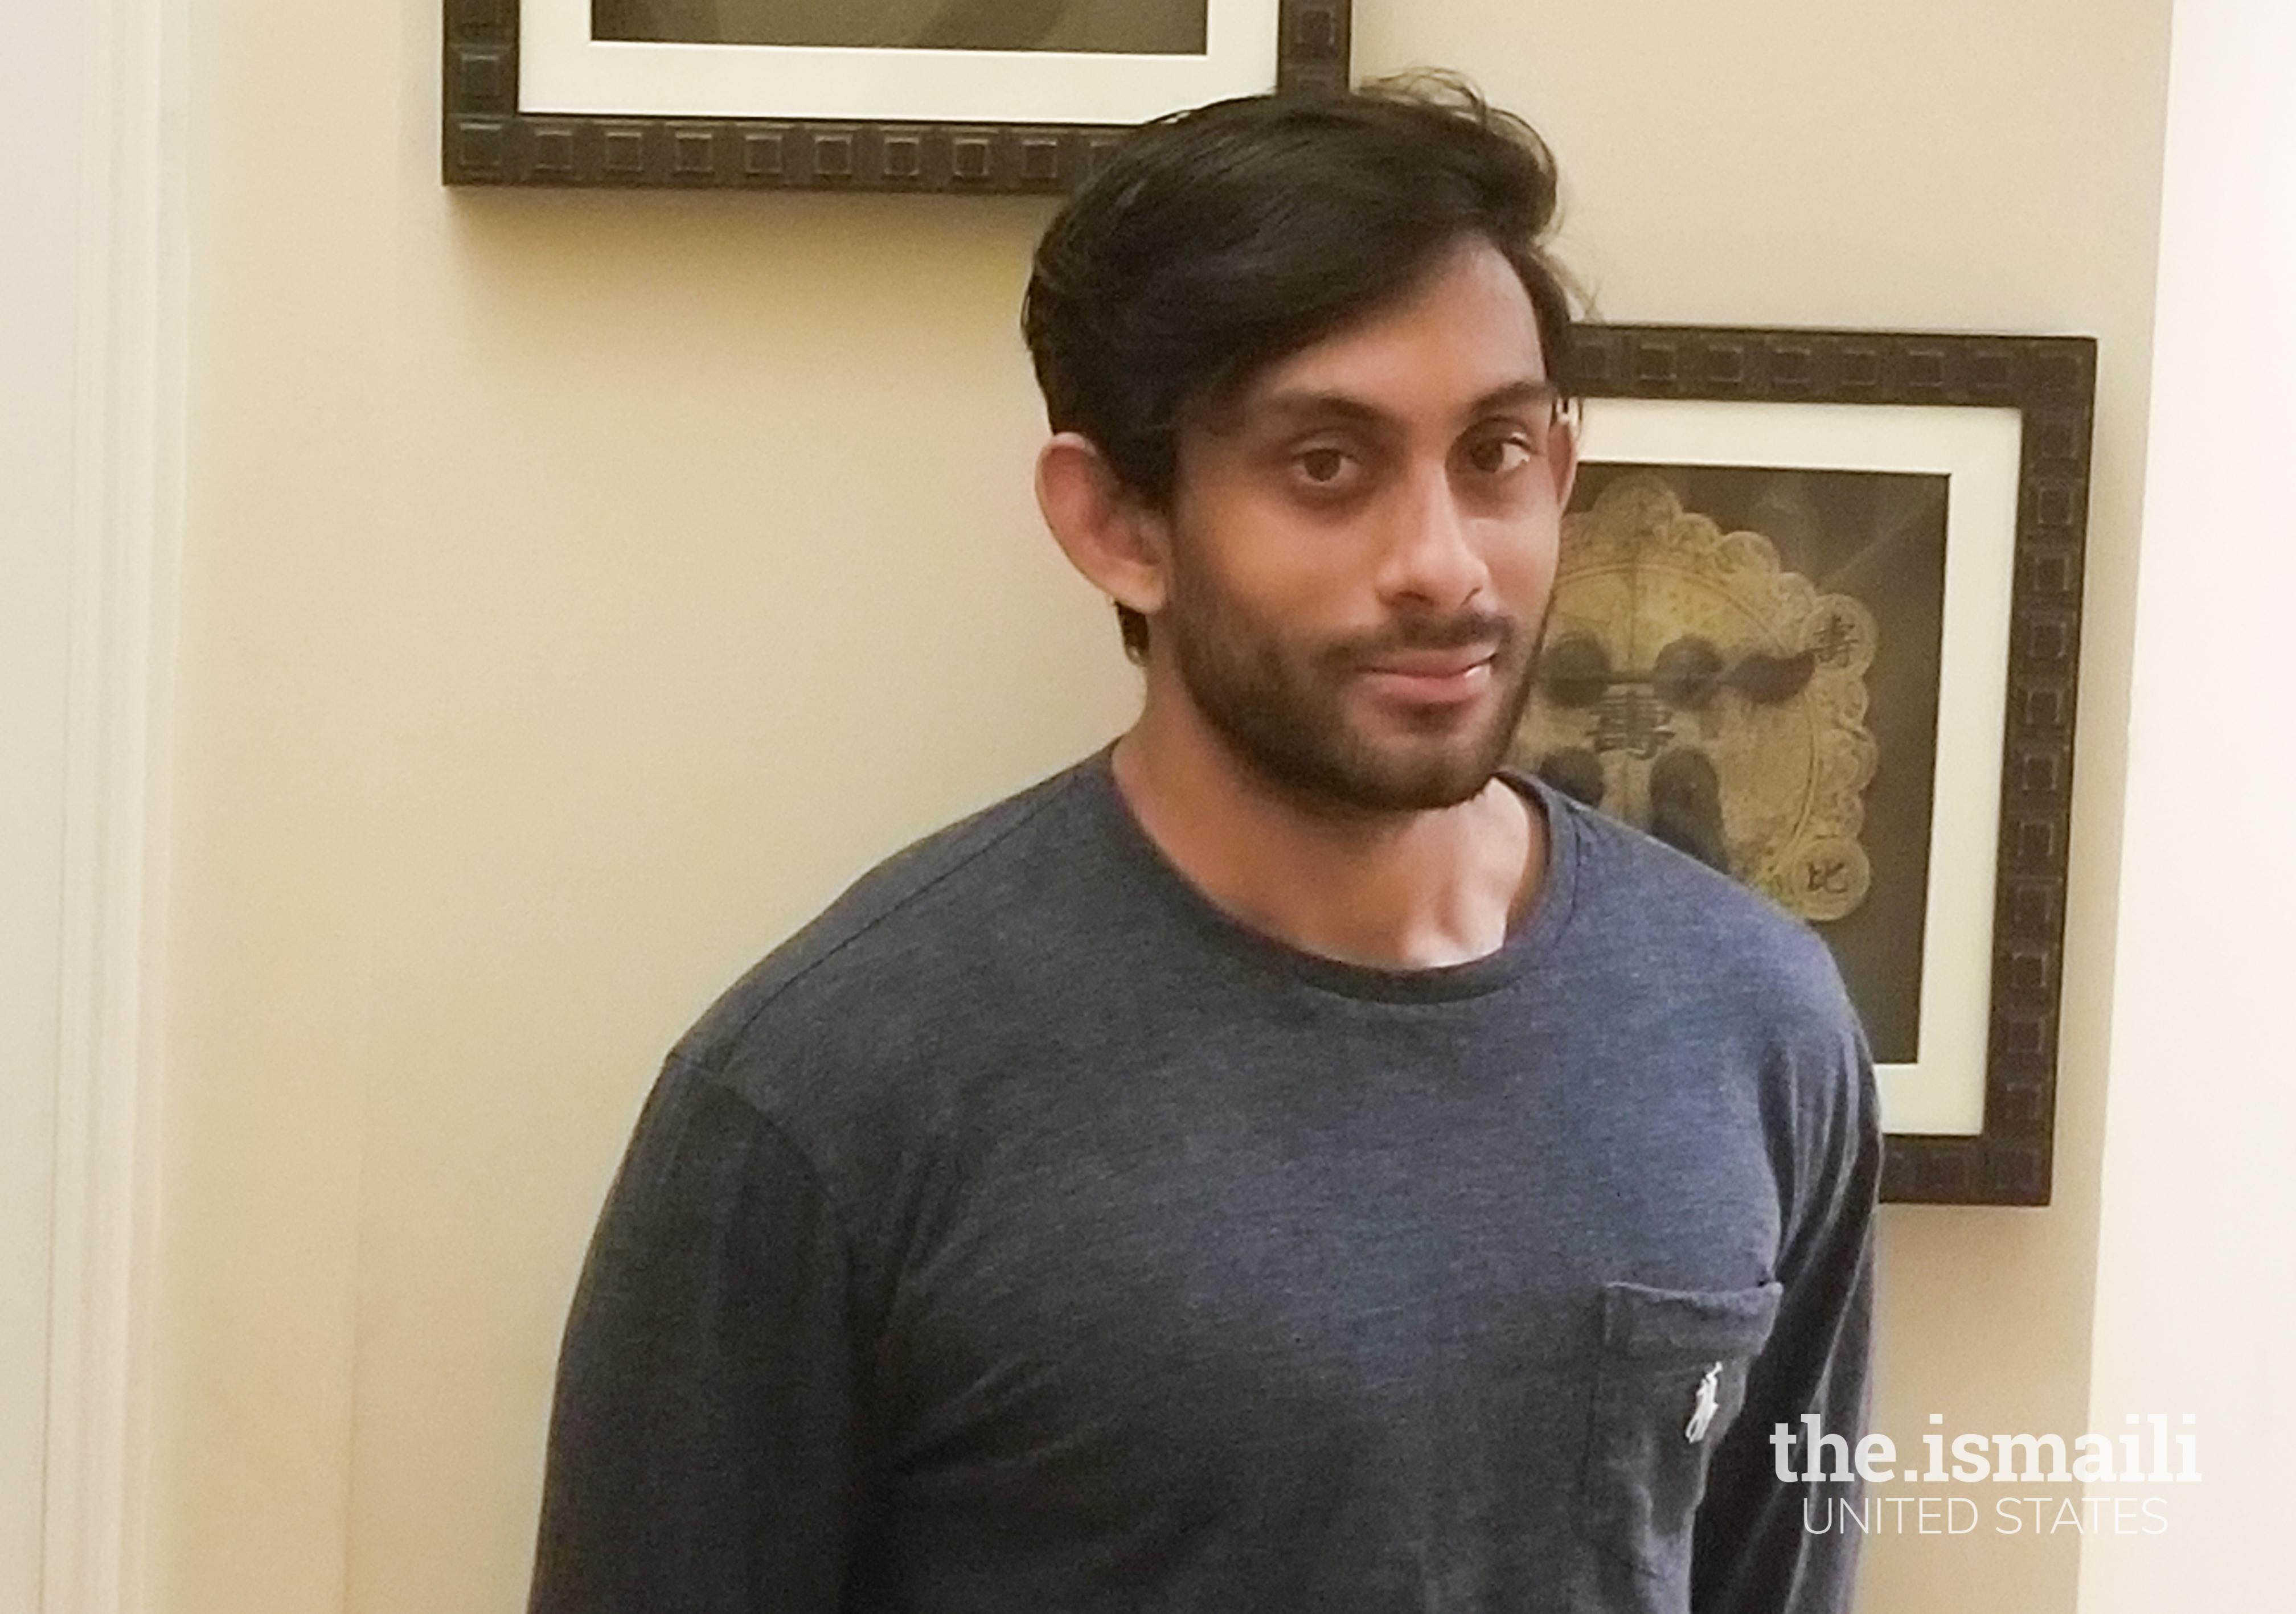 Zaeem Ukani, engaged in Carolyn Bourdeaux's campaign in Georgia.